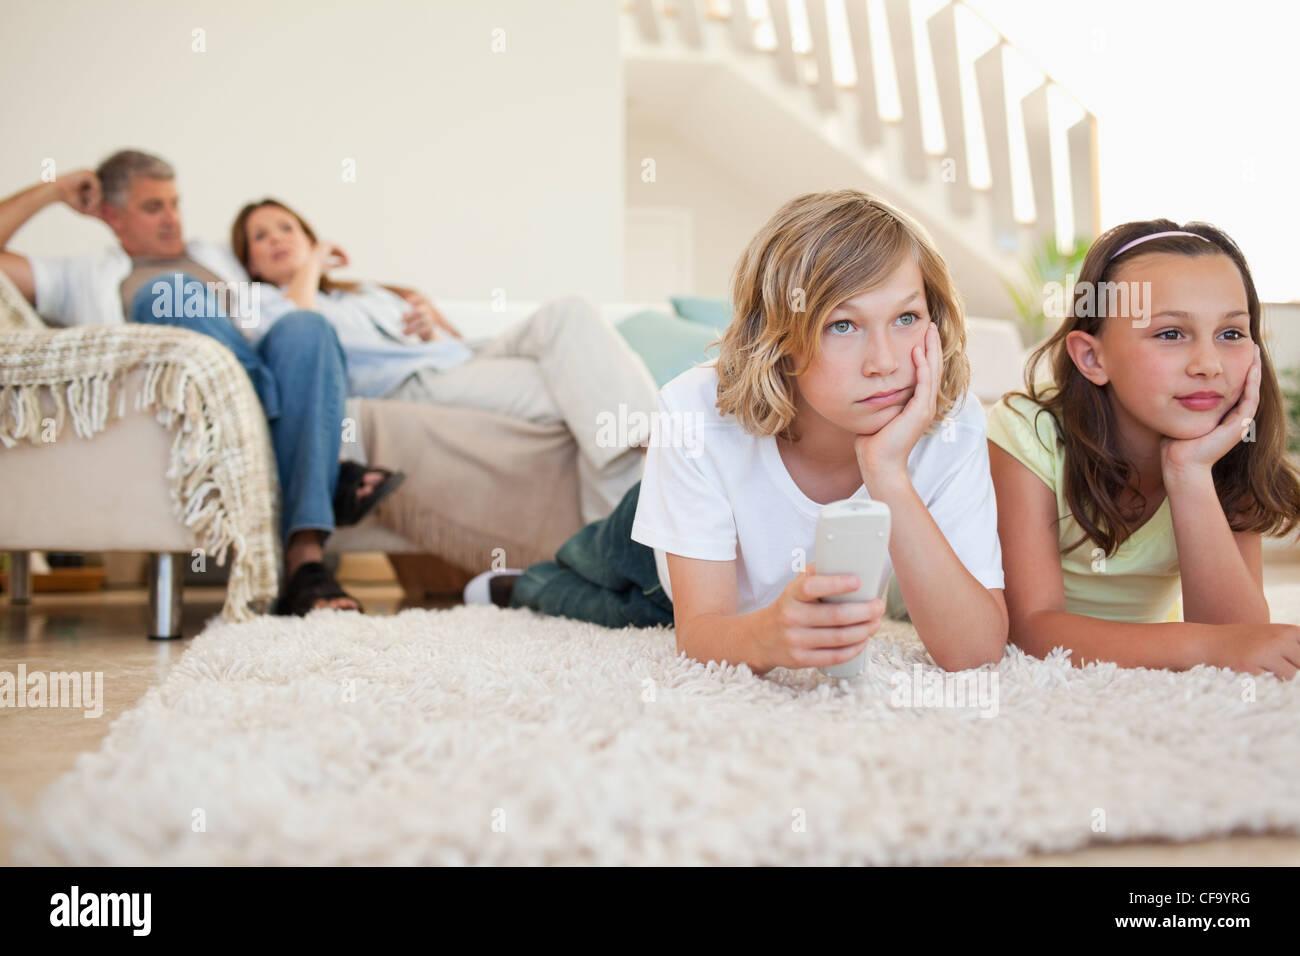 Siblings bored by tv program - Stock Image